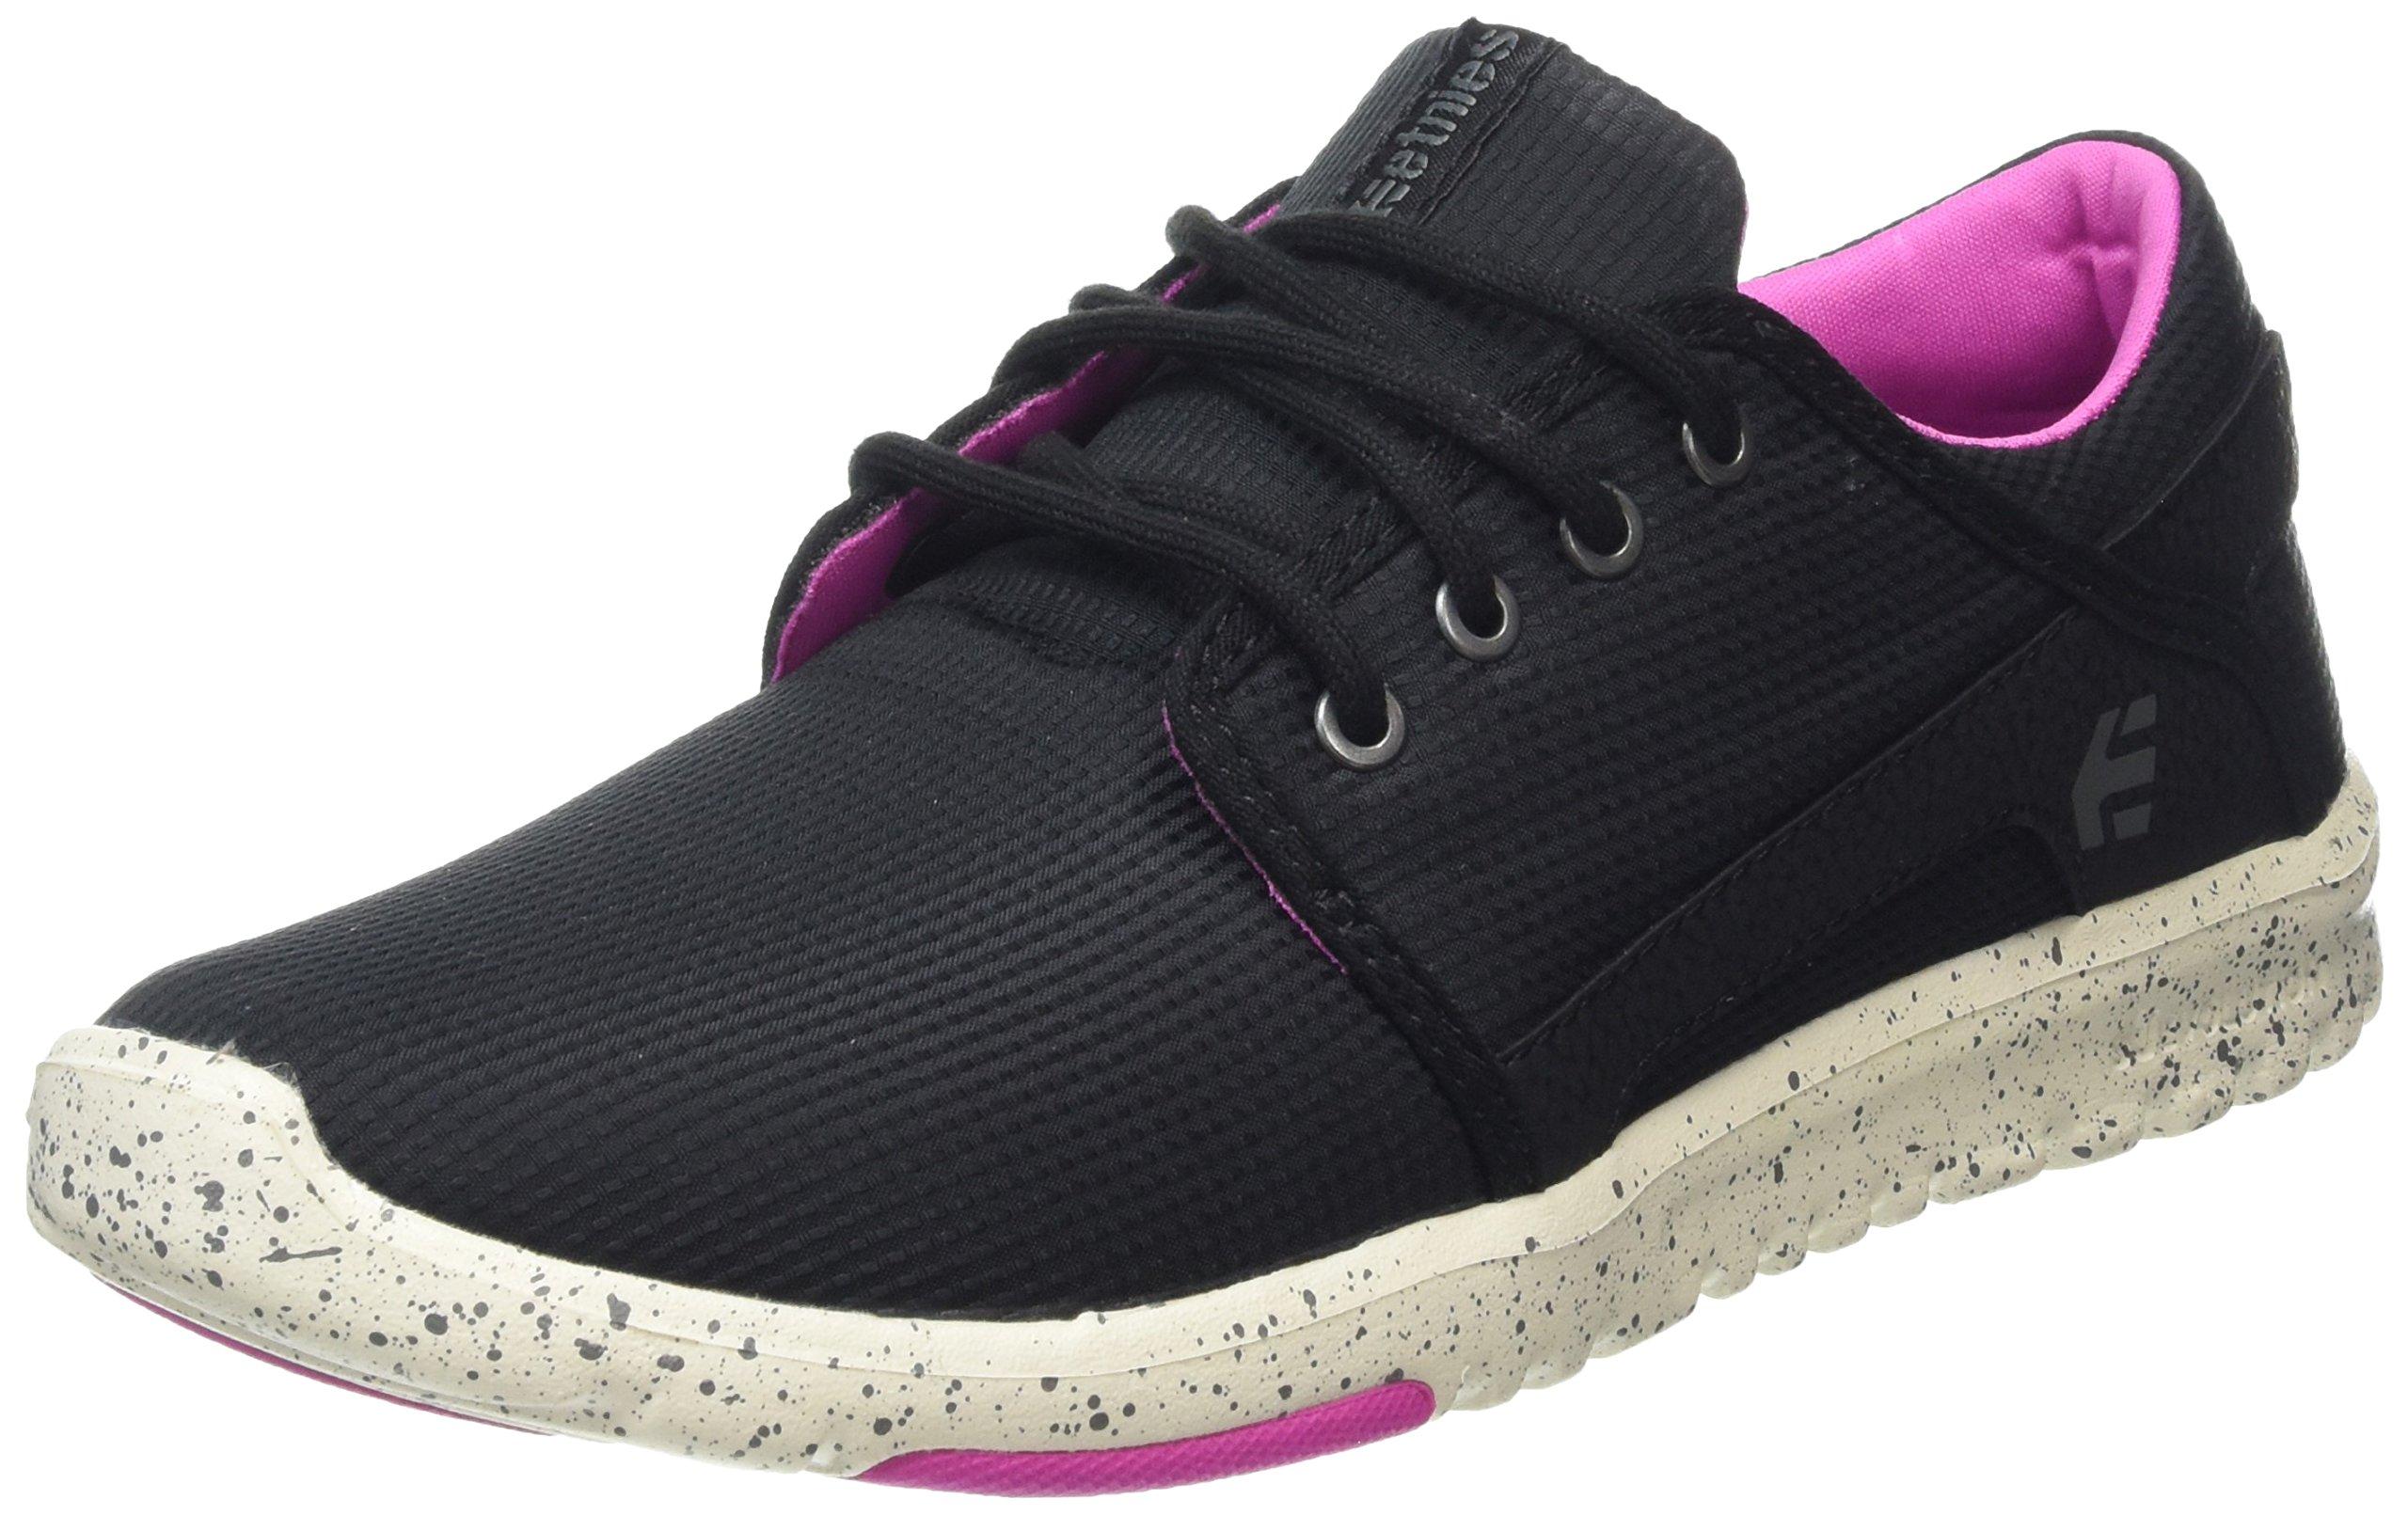 Etnies Women's Scout W's Skateboarding Shoe, Black/Pink, 5 M US by Etnies